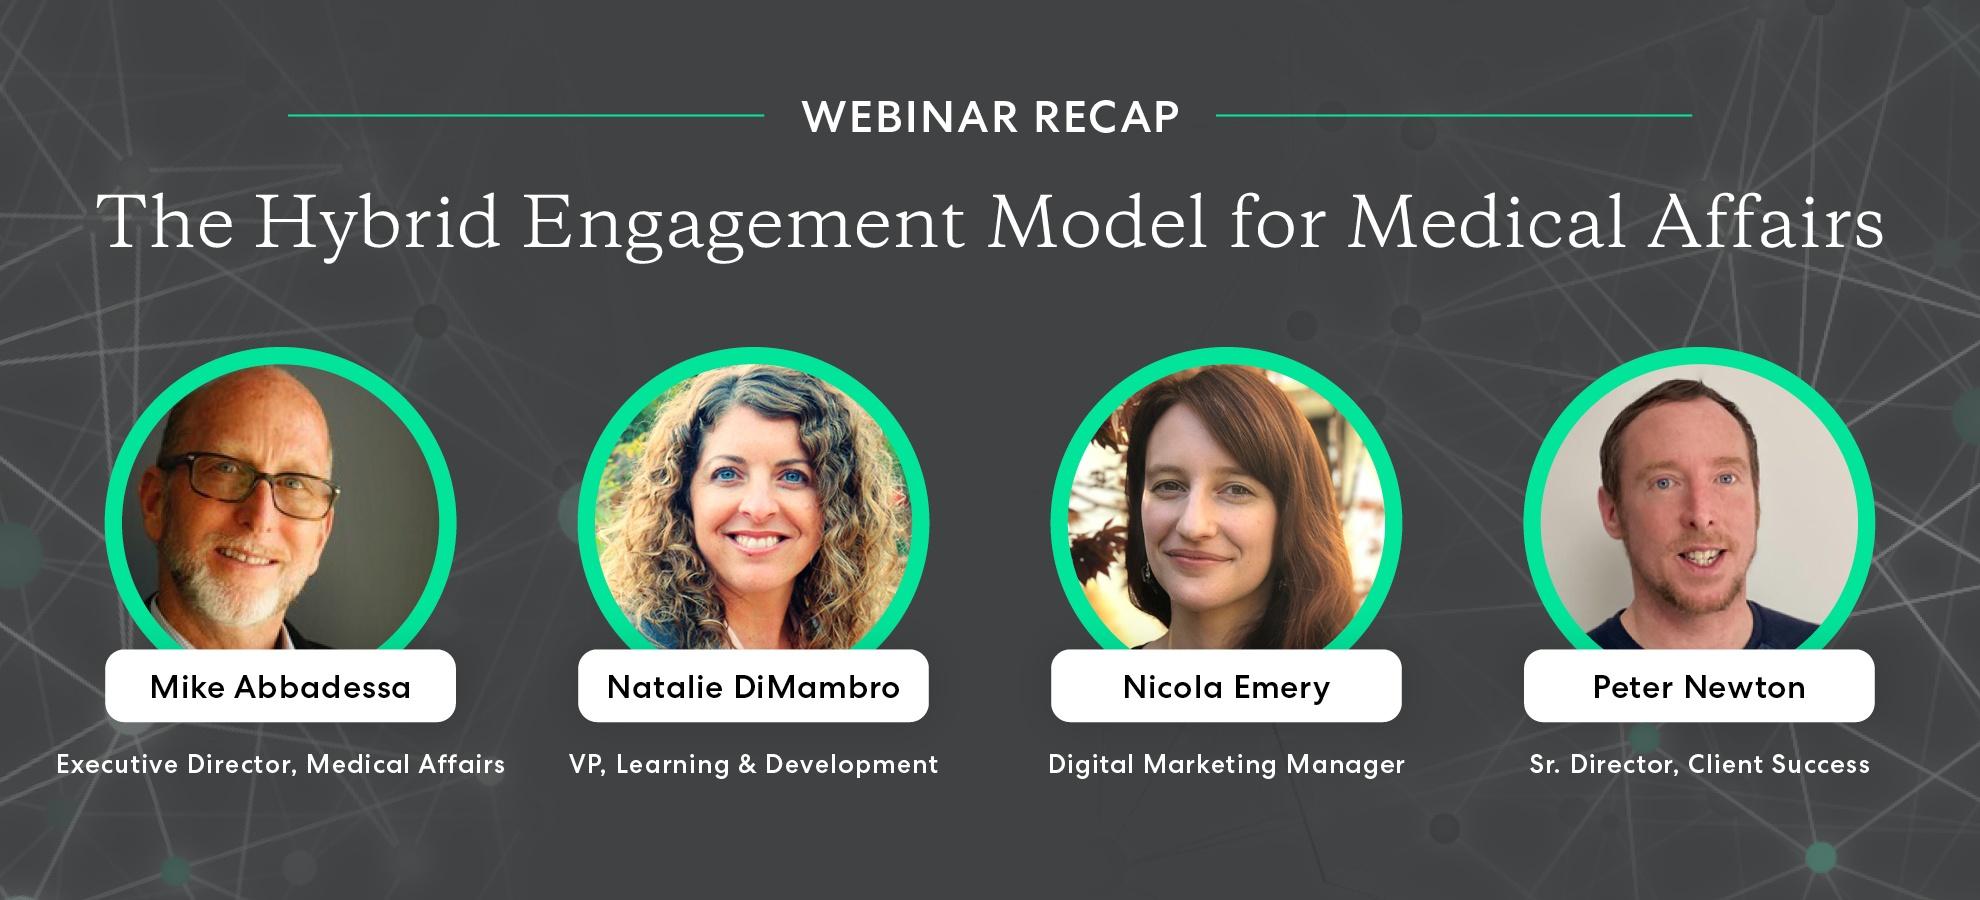 Webinar recap: The Hybrid Engagement Model for Medical Affairs